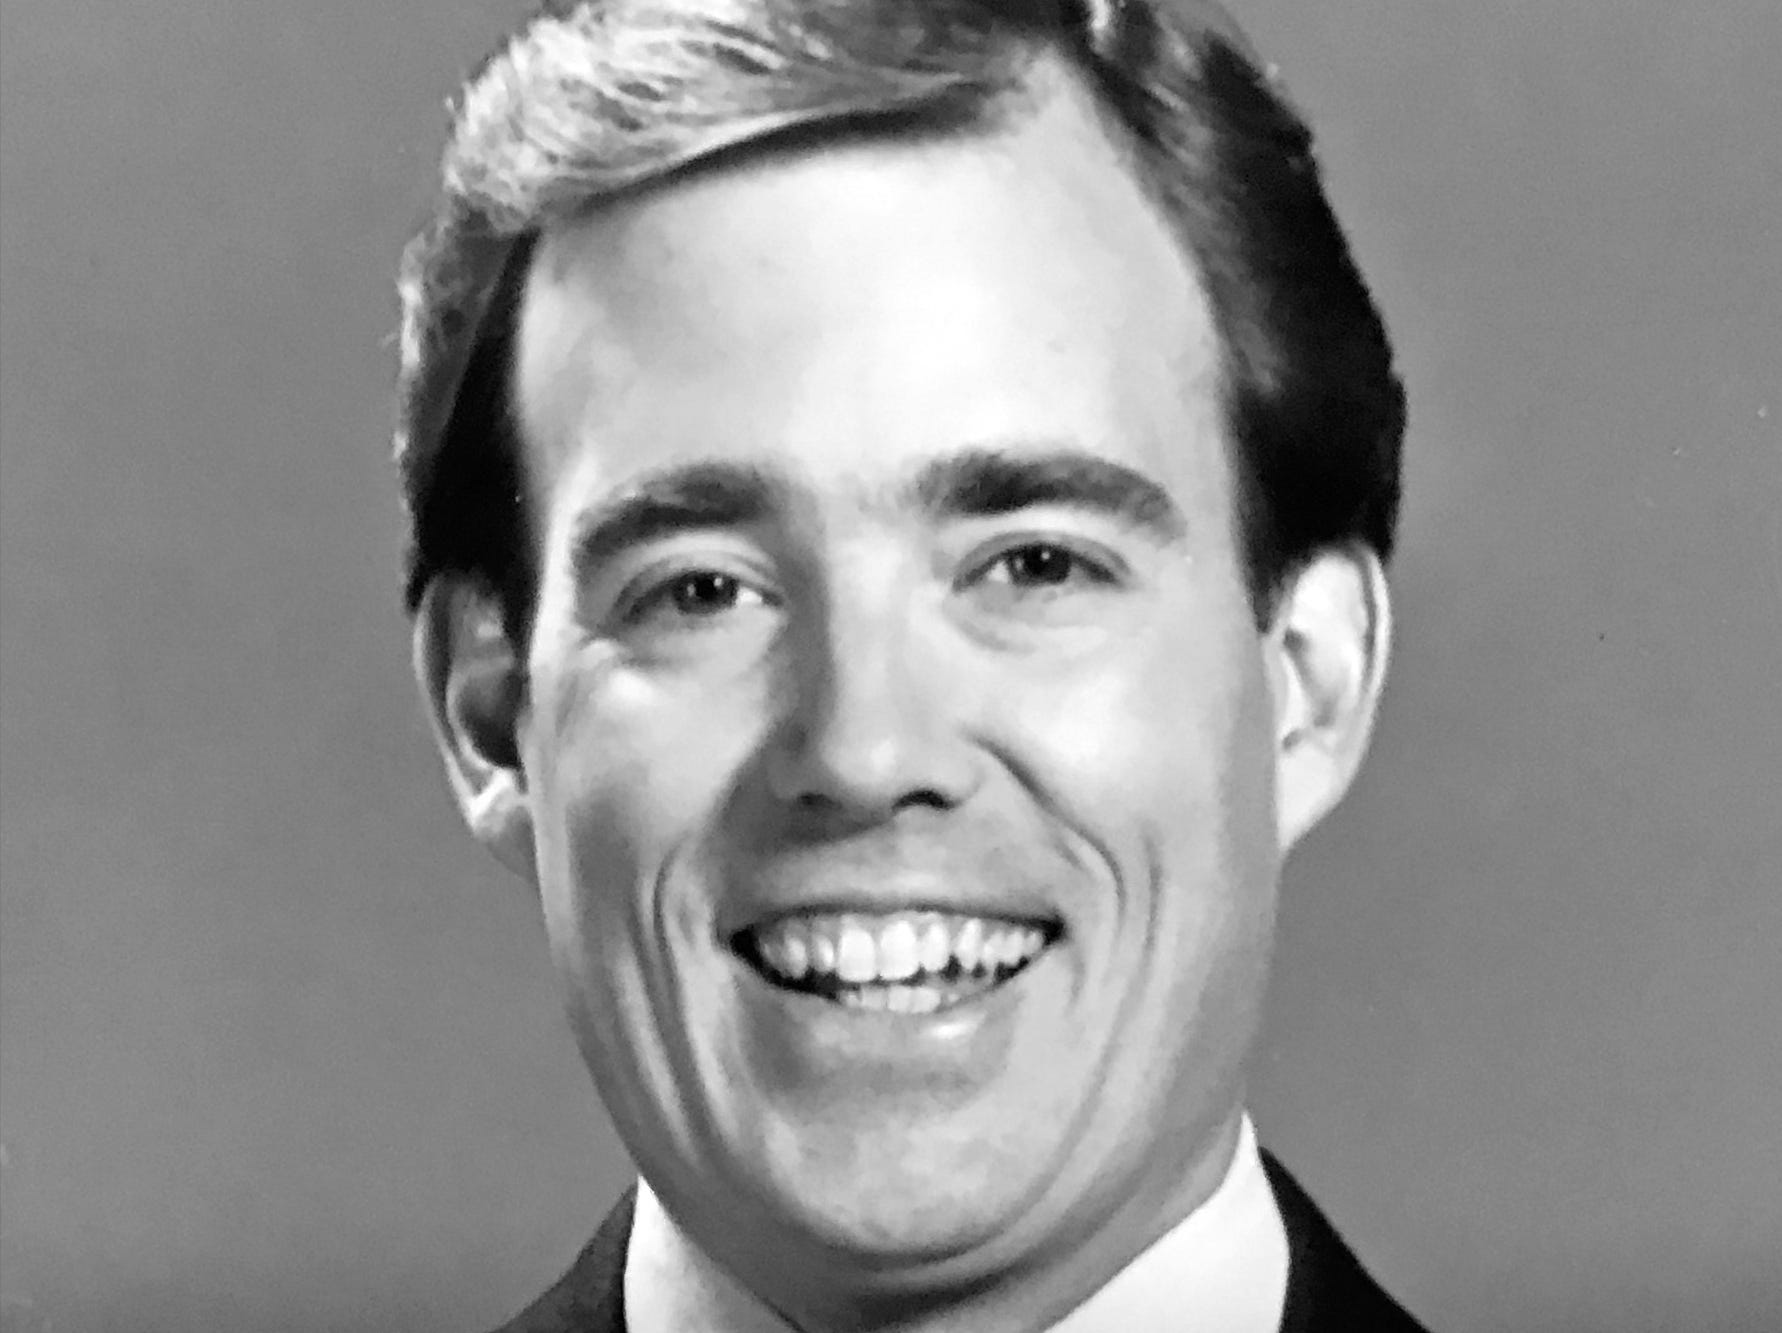 Former WTTV Channel 4 anchor Doug Rafferty dead at 66